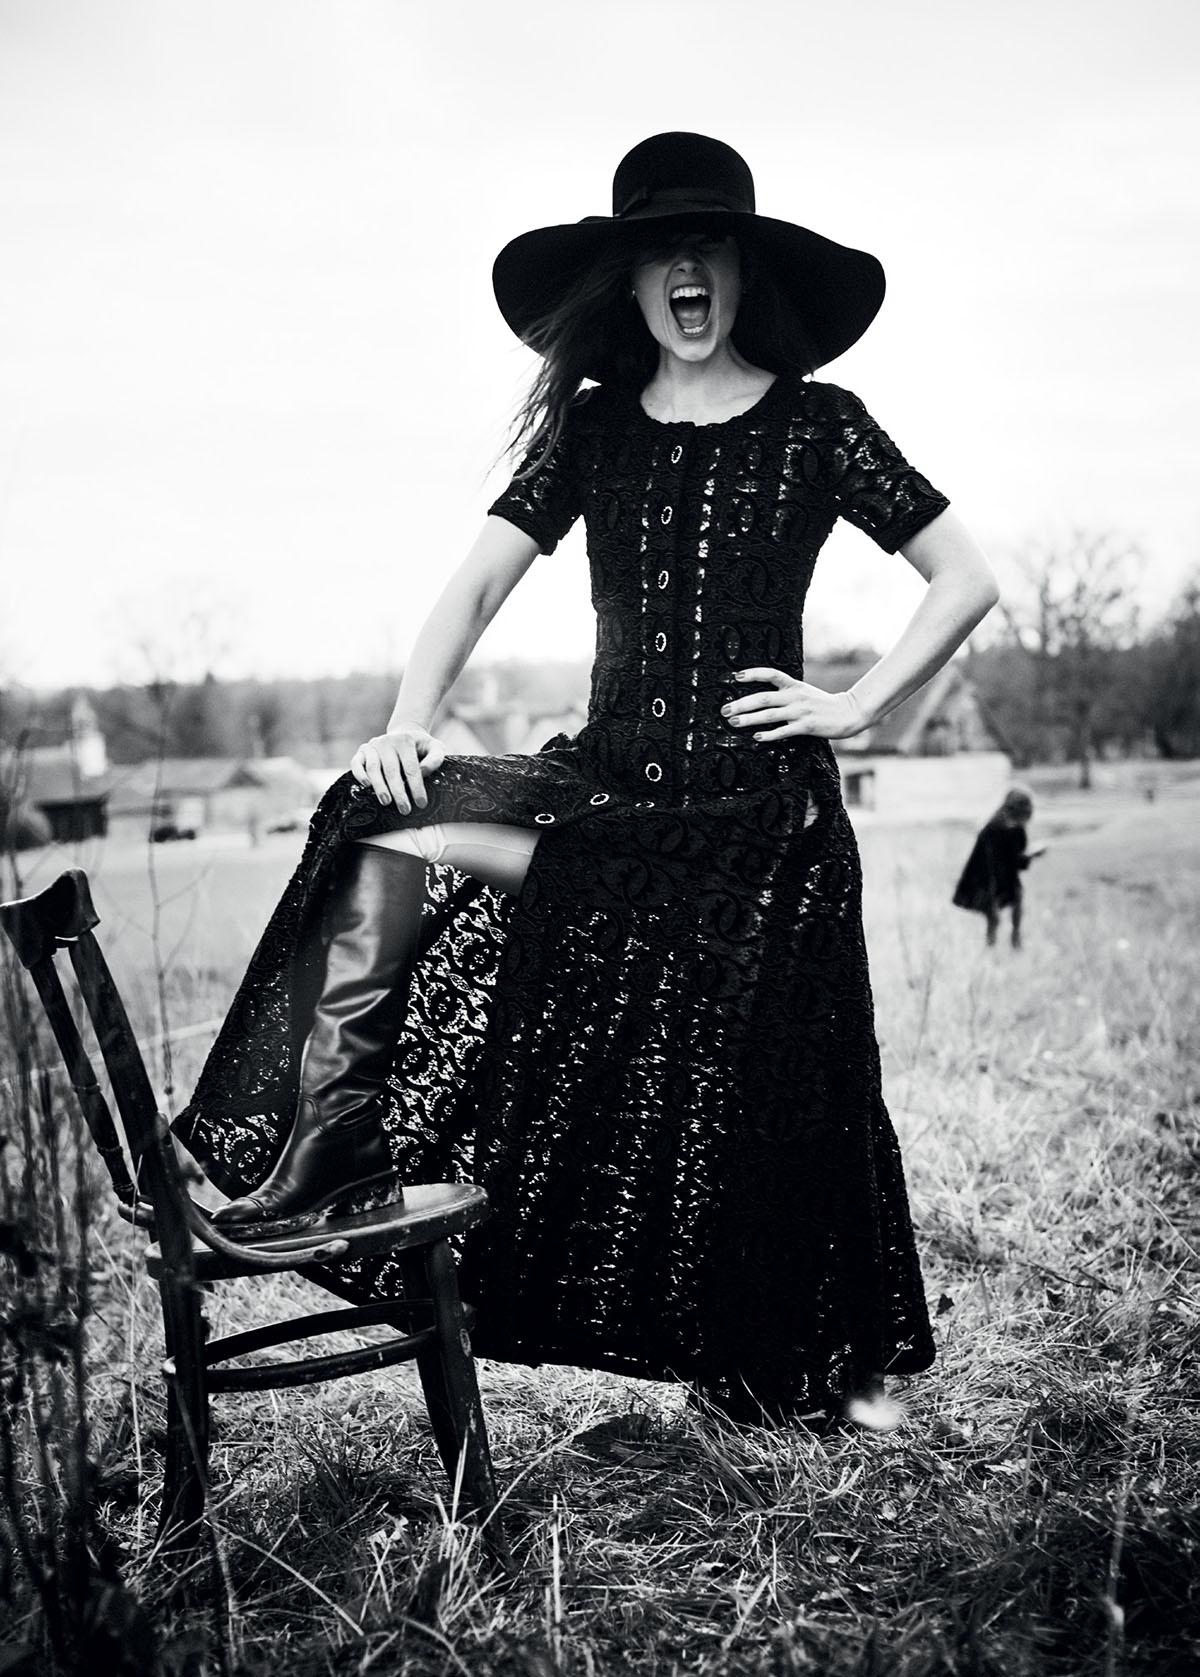 Keira Knightley covers Harper's Bazaar UK July 2021 by Boo George